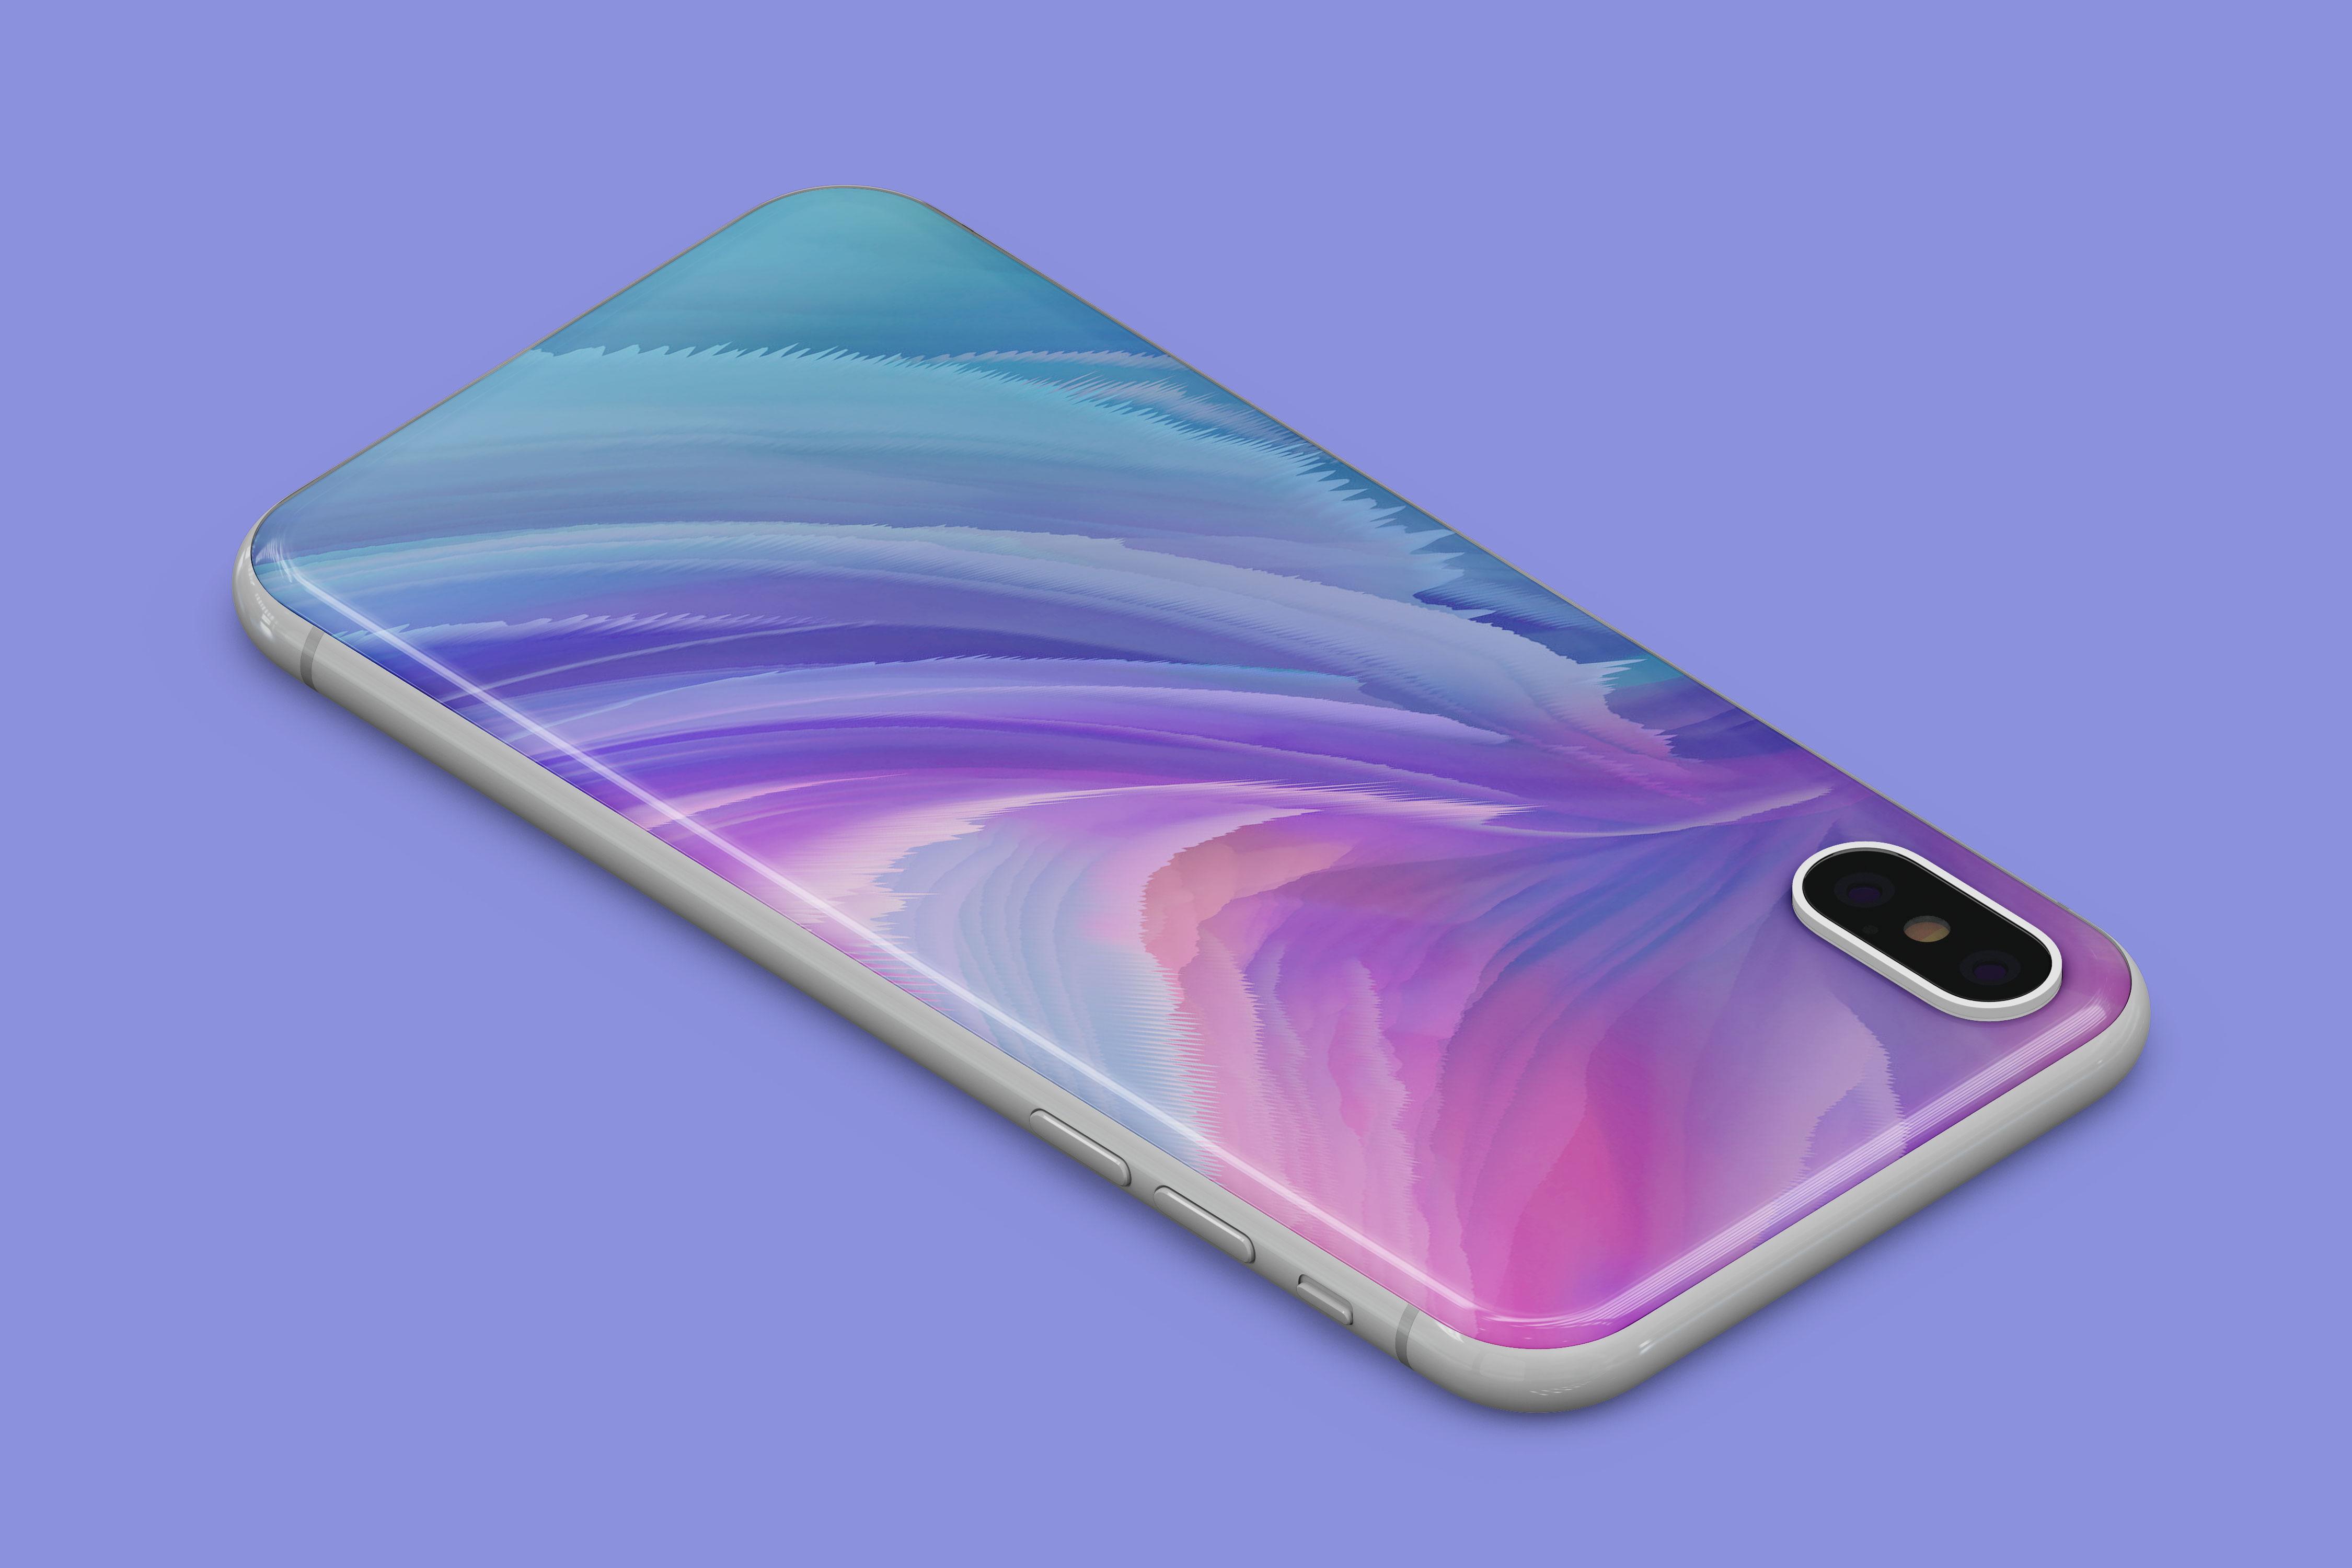 181d674a2e55bd1 - 时尚绚丽手机壳样机